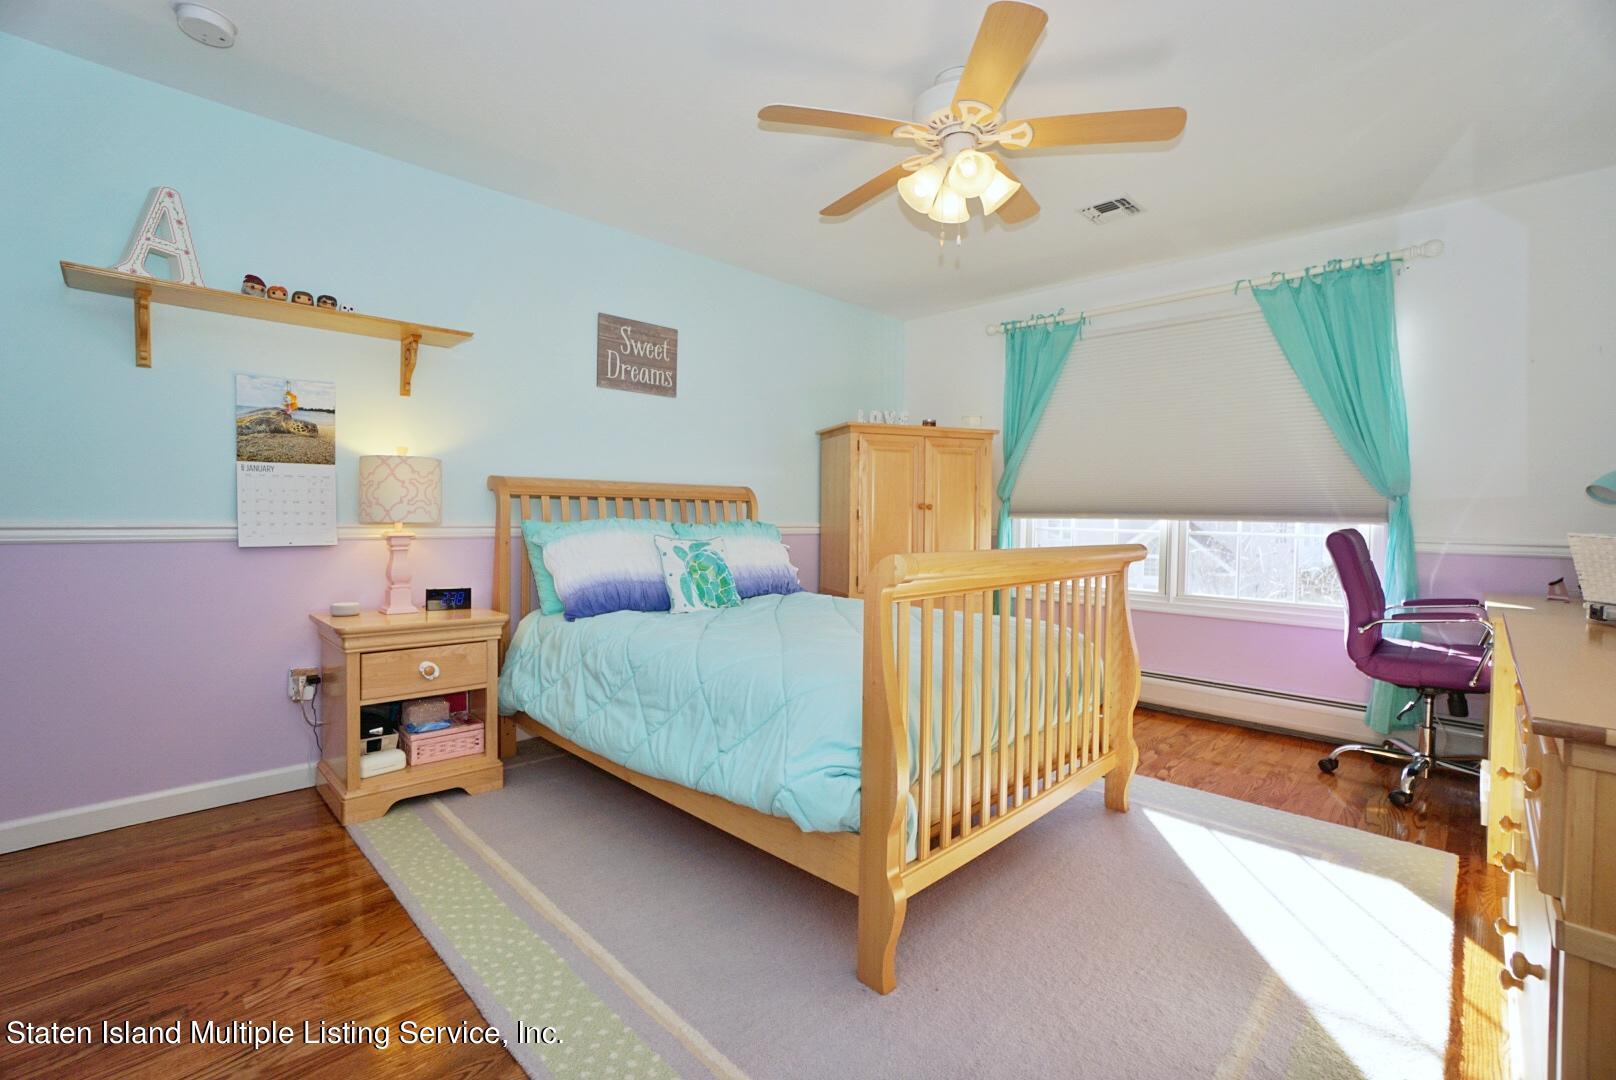 Single Family - Detached 31 Belwood Loop  Staten Island, NY 10307, MLS-1143133-44